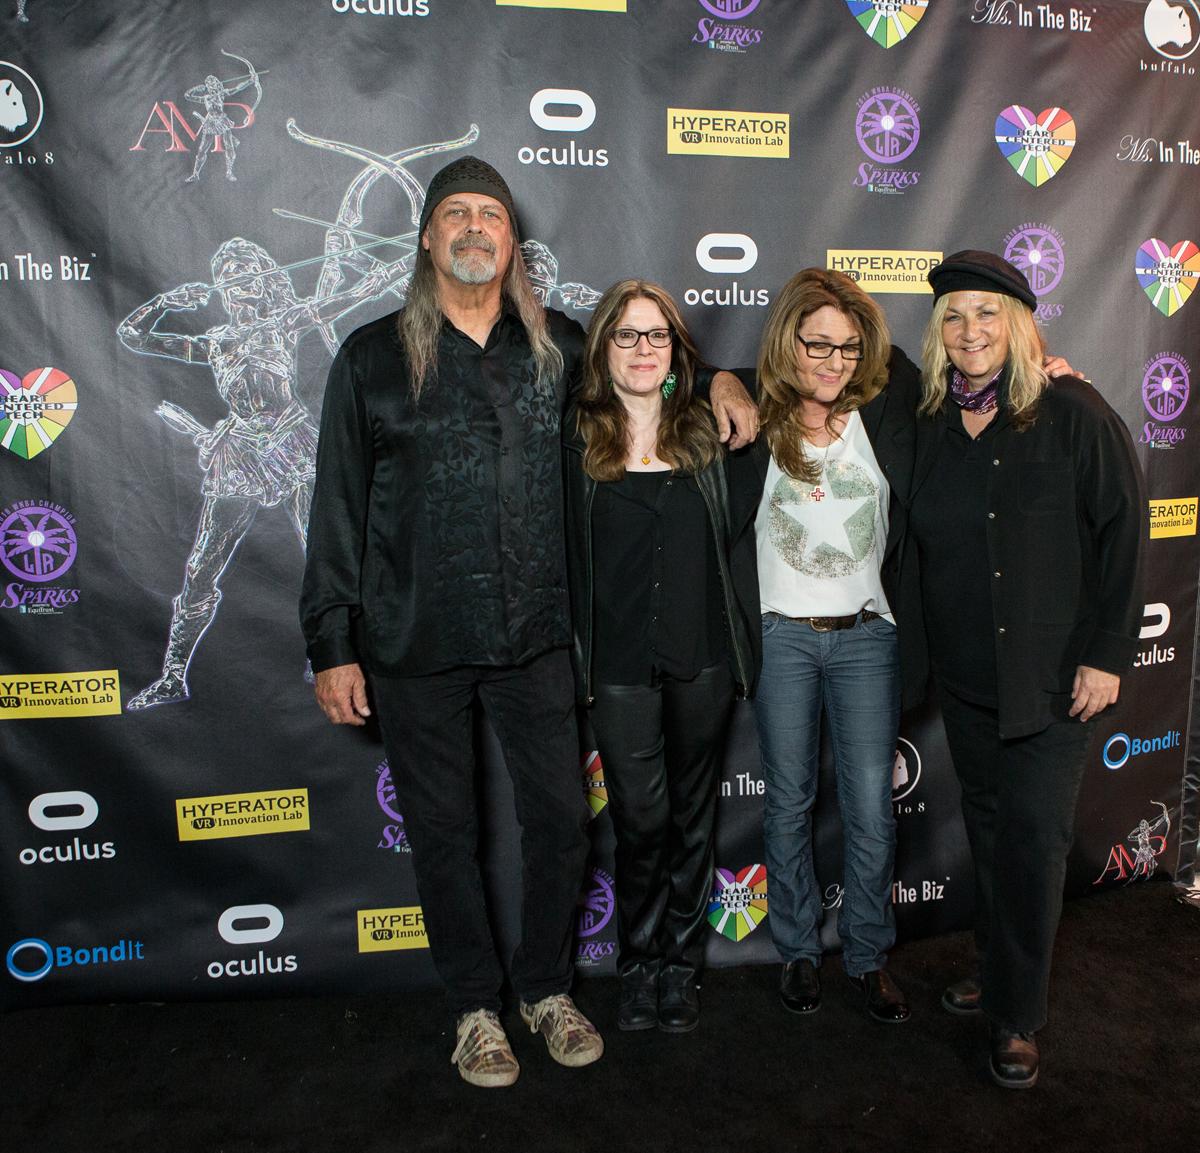 Steve Soest, Angela Riggio, Michelle Mangione, Linda Falzone